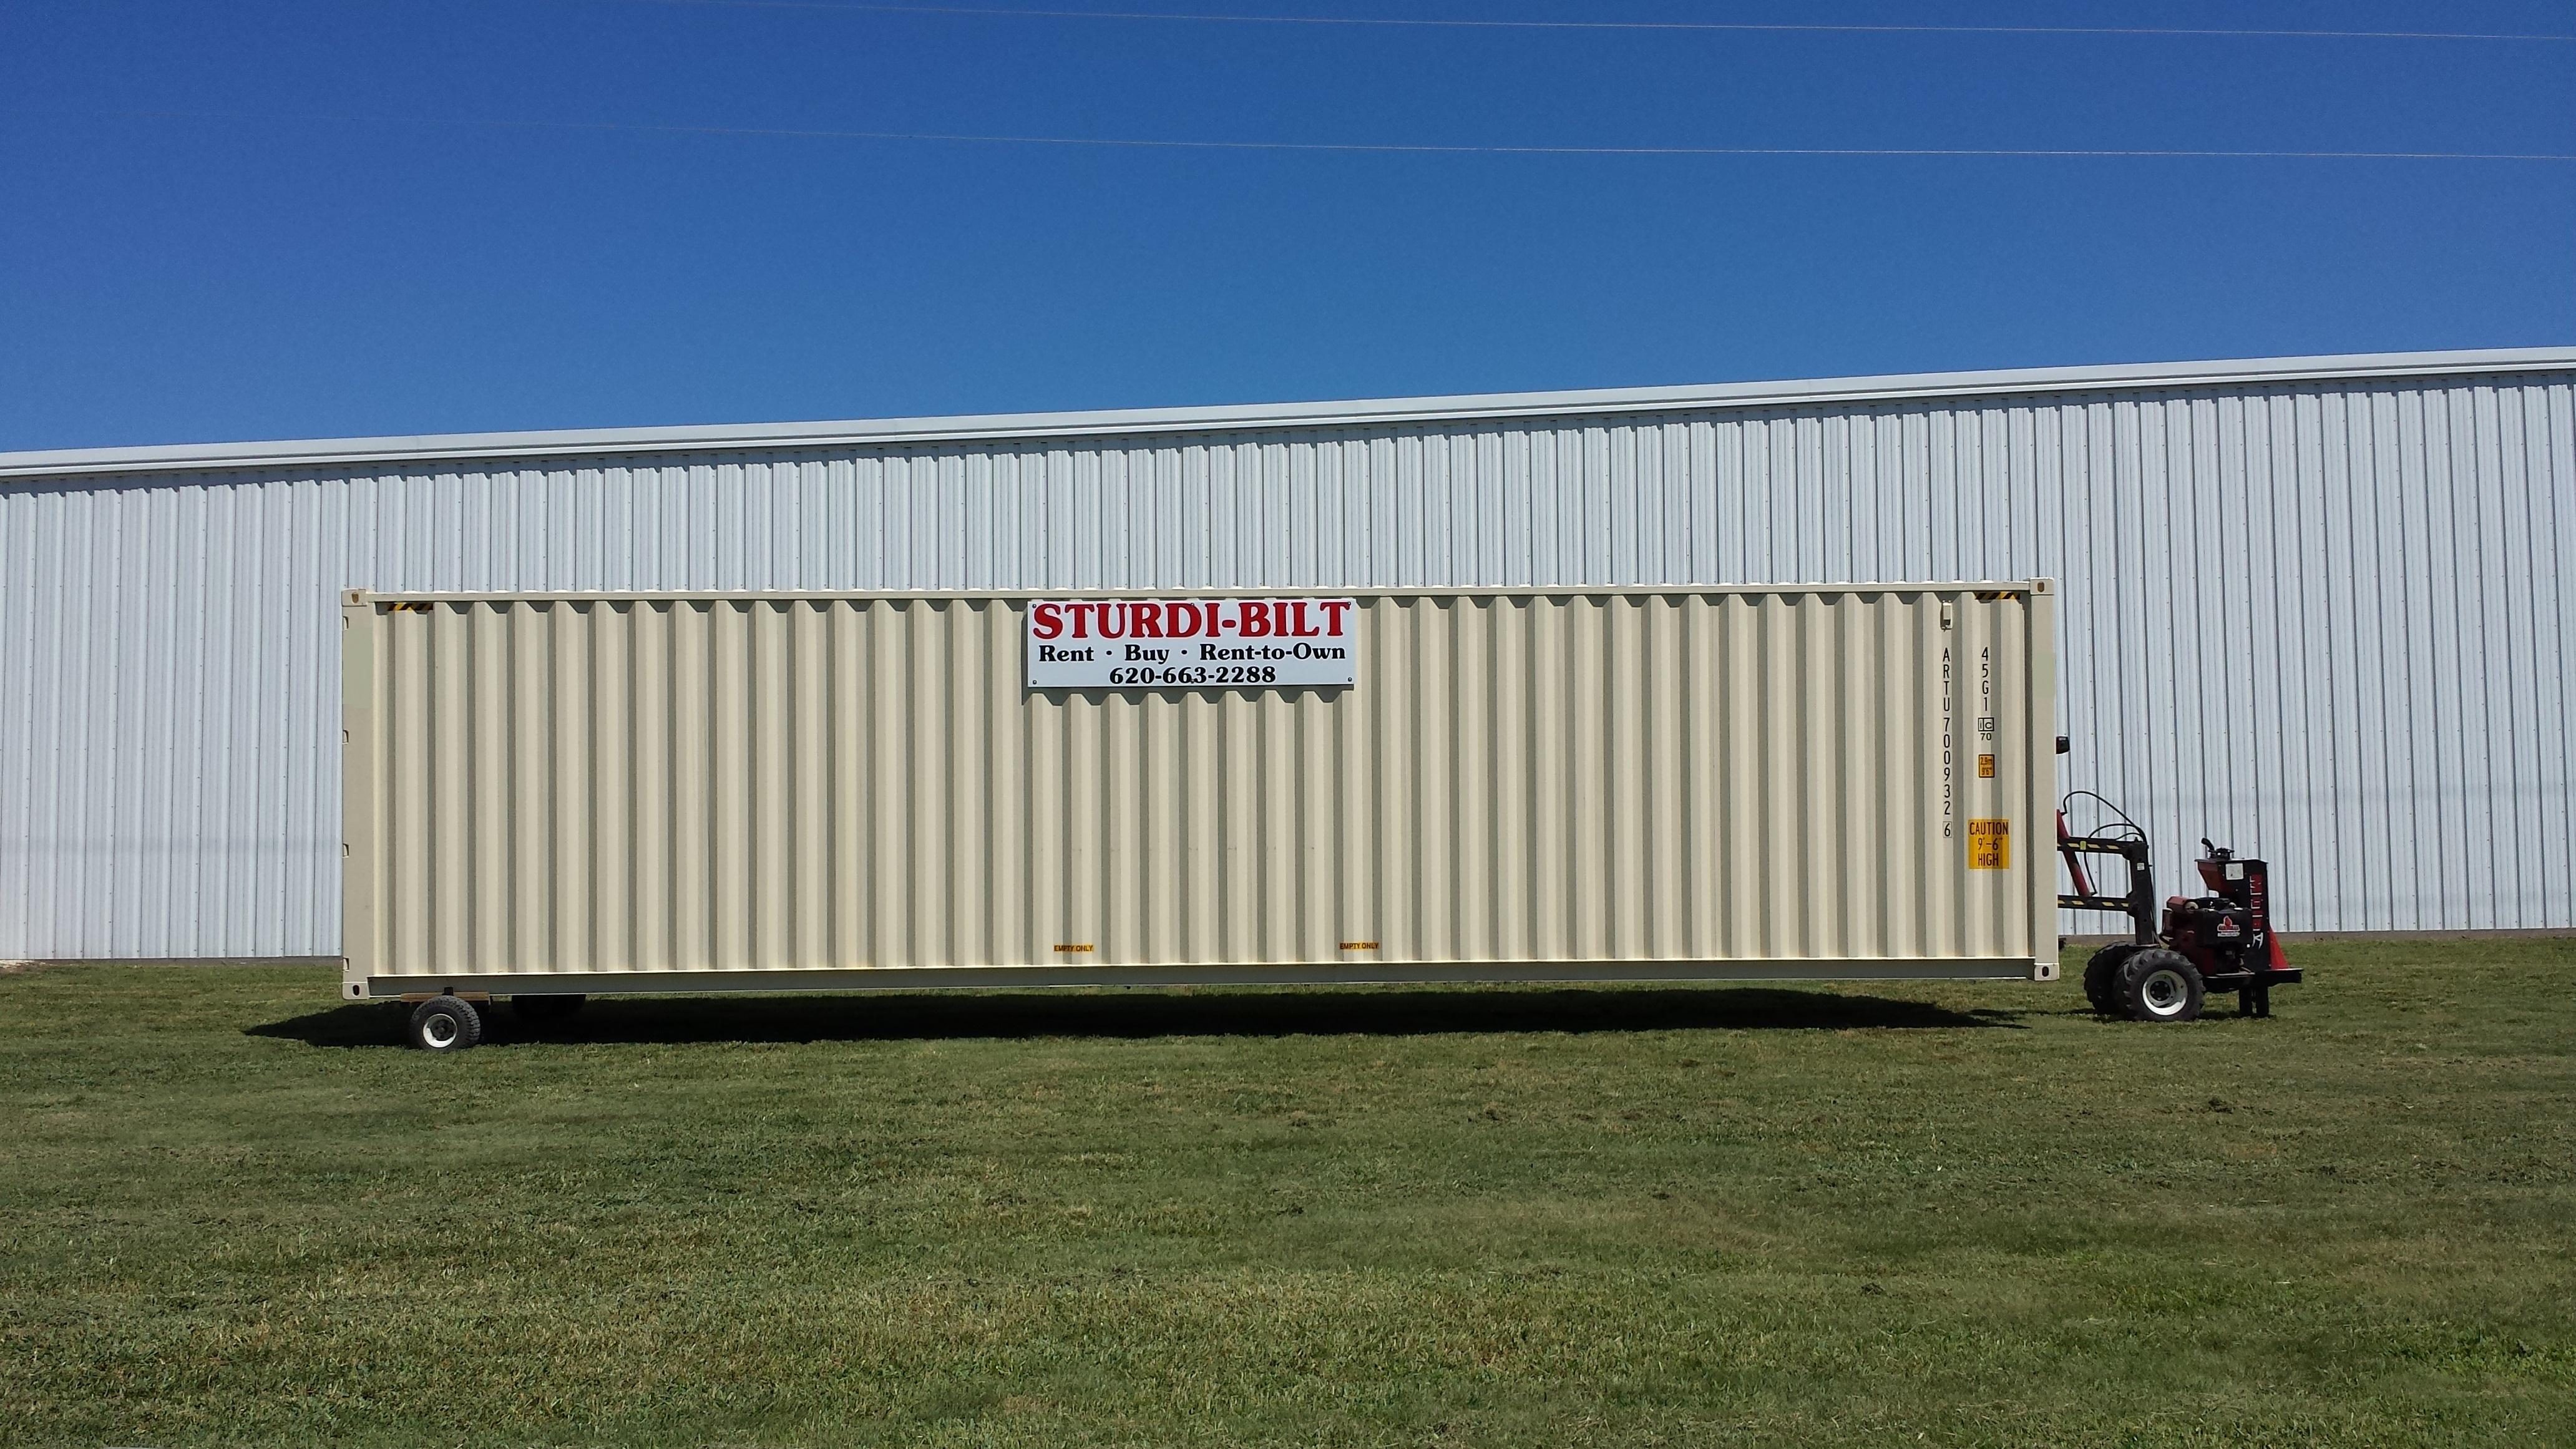 Rent To Own Storage Containers Part - 26: Sturdi-Bilt